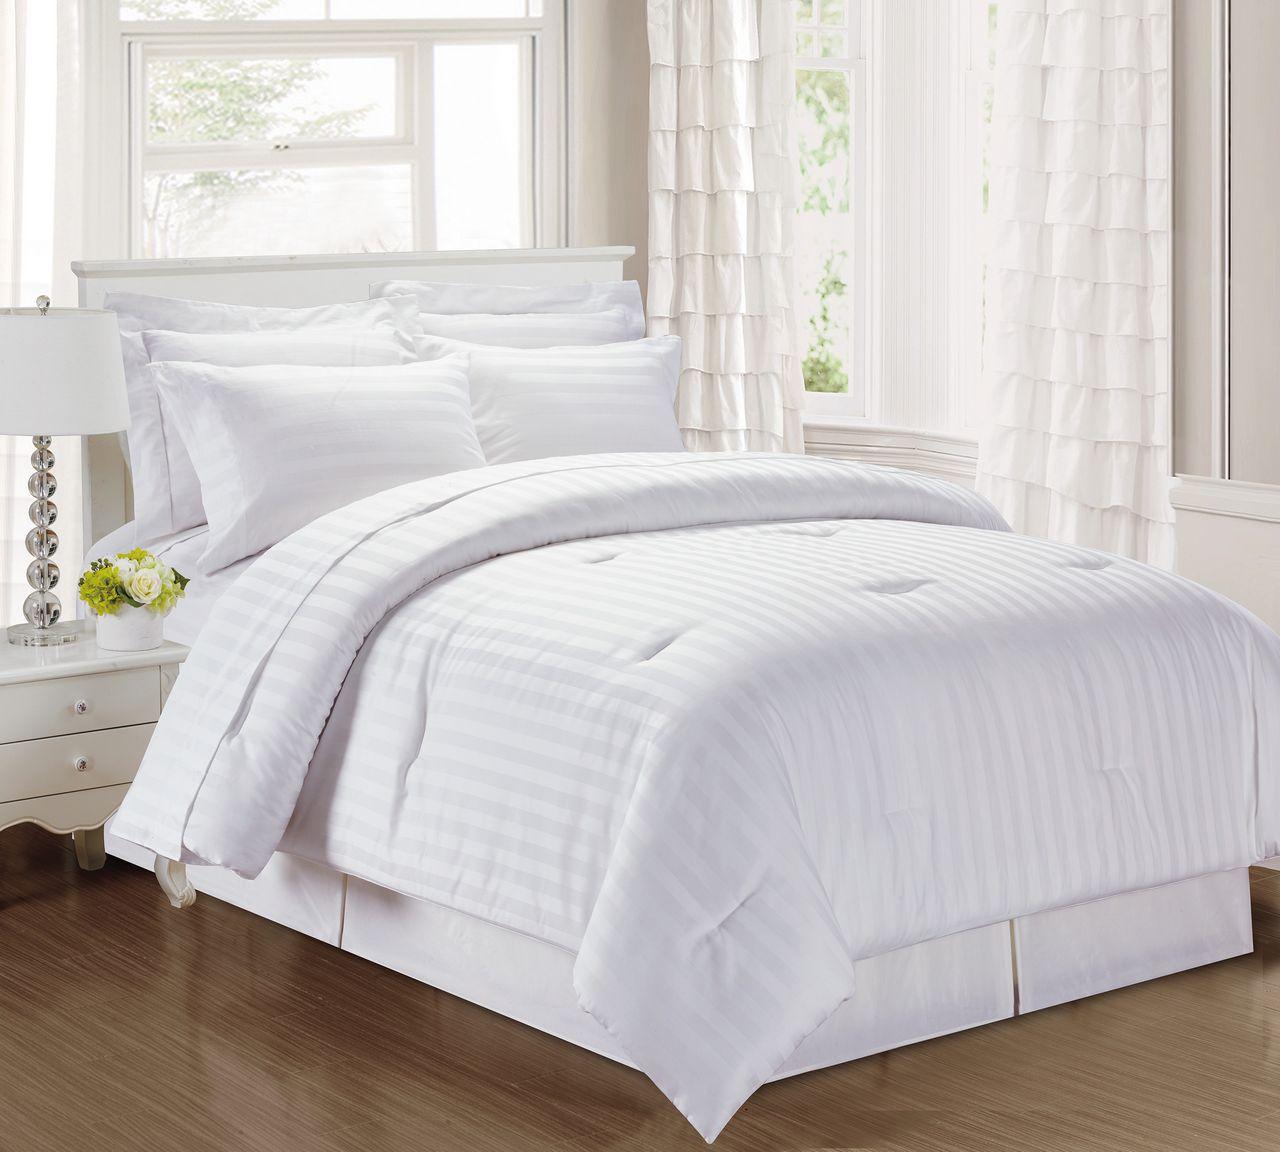 3 Piece Damask Stripe 500 Thread Count Cotton Comforter